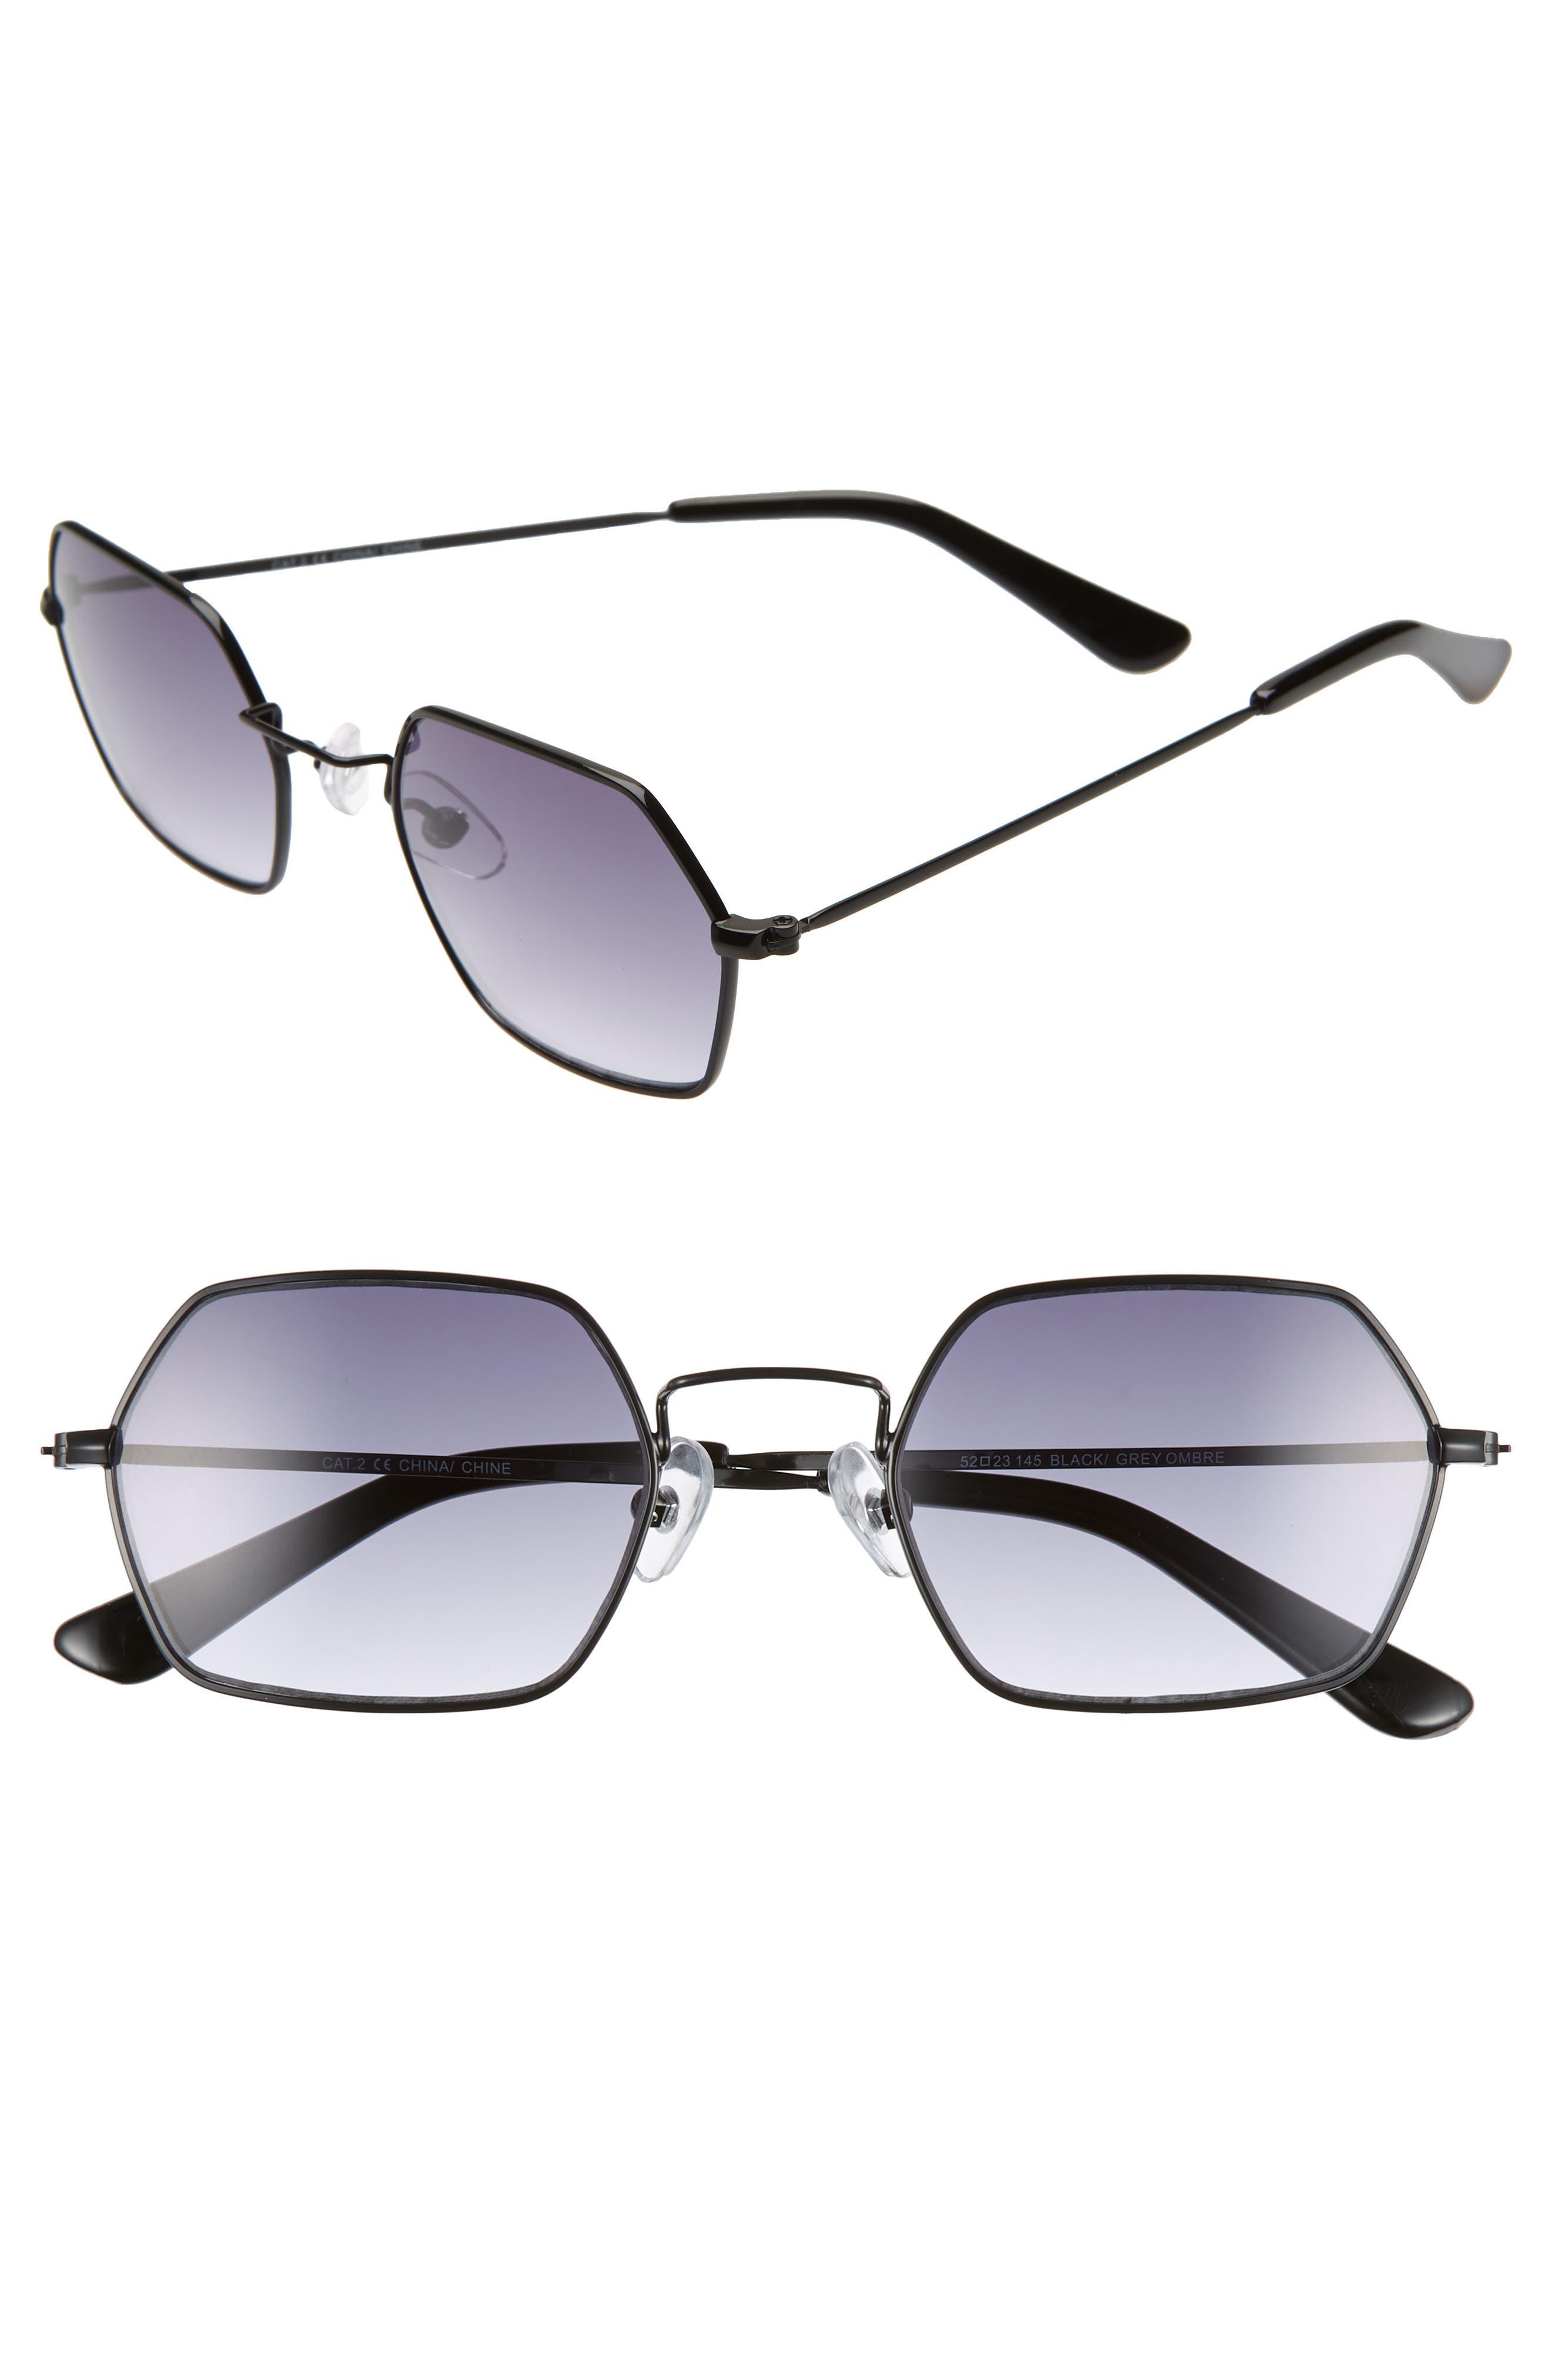 THE RAIL, Russo 52mm Hexagon Sunglasses, Main thumbnail 1, color, BLACK/ GREY OMBRE